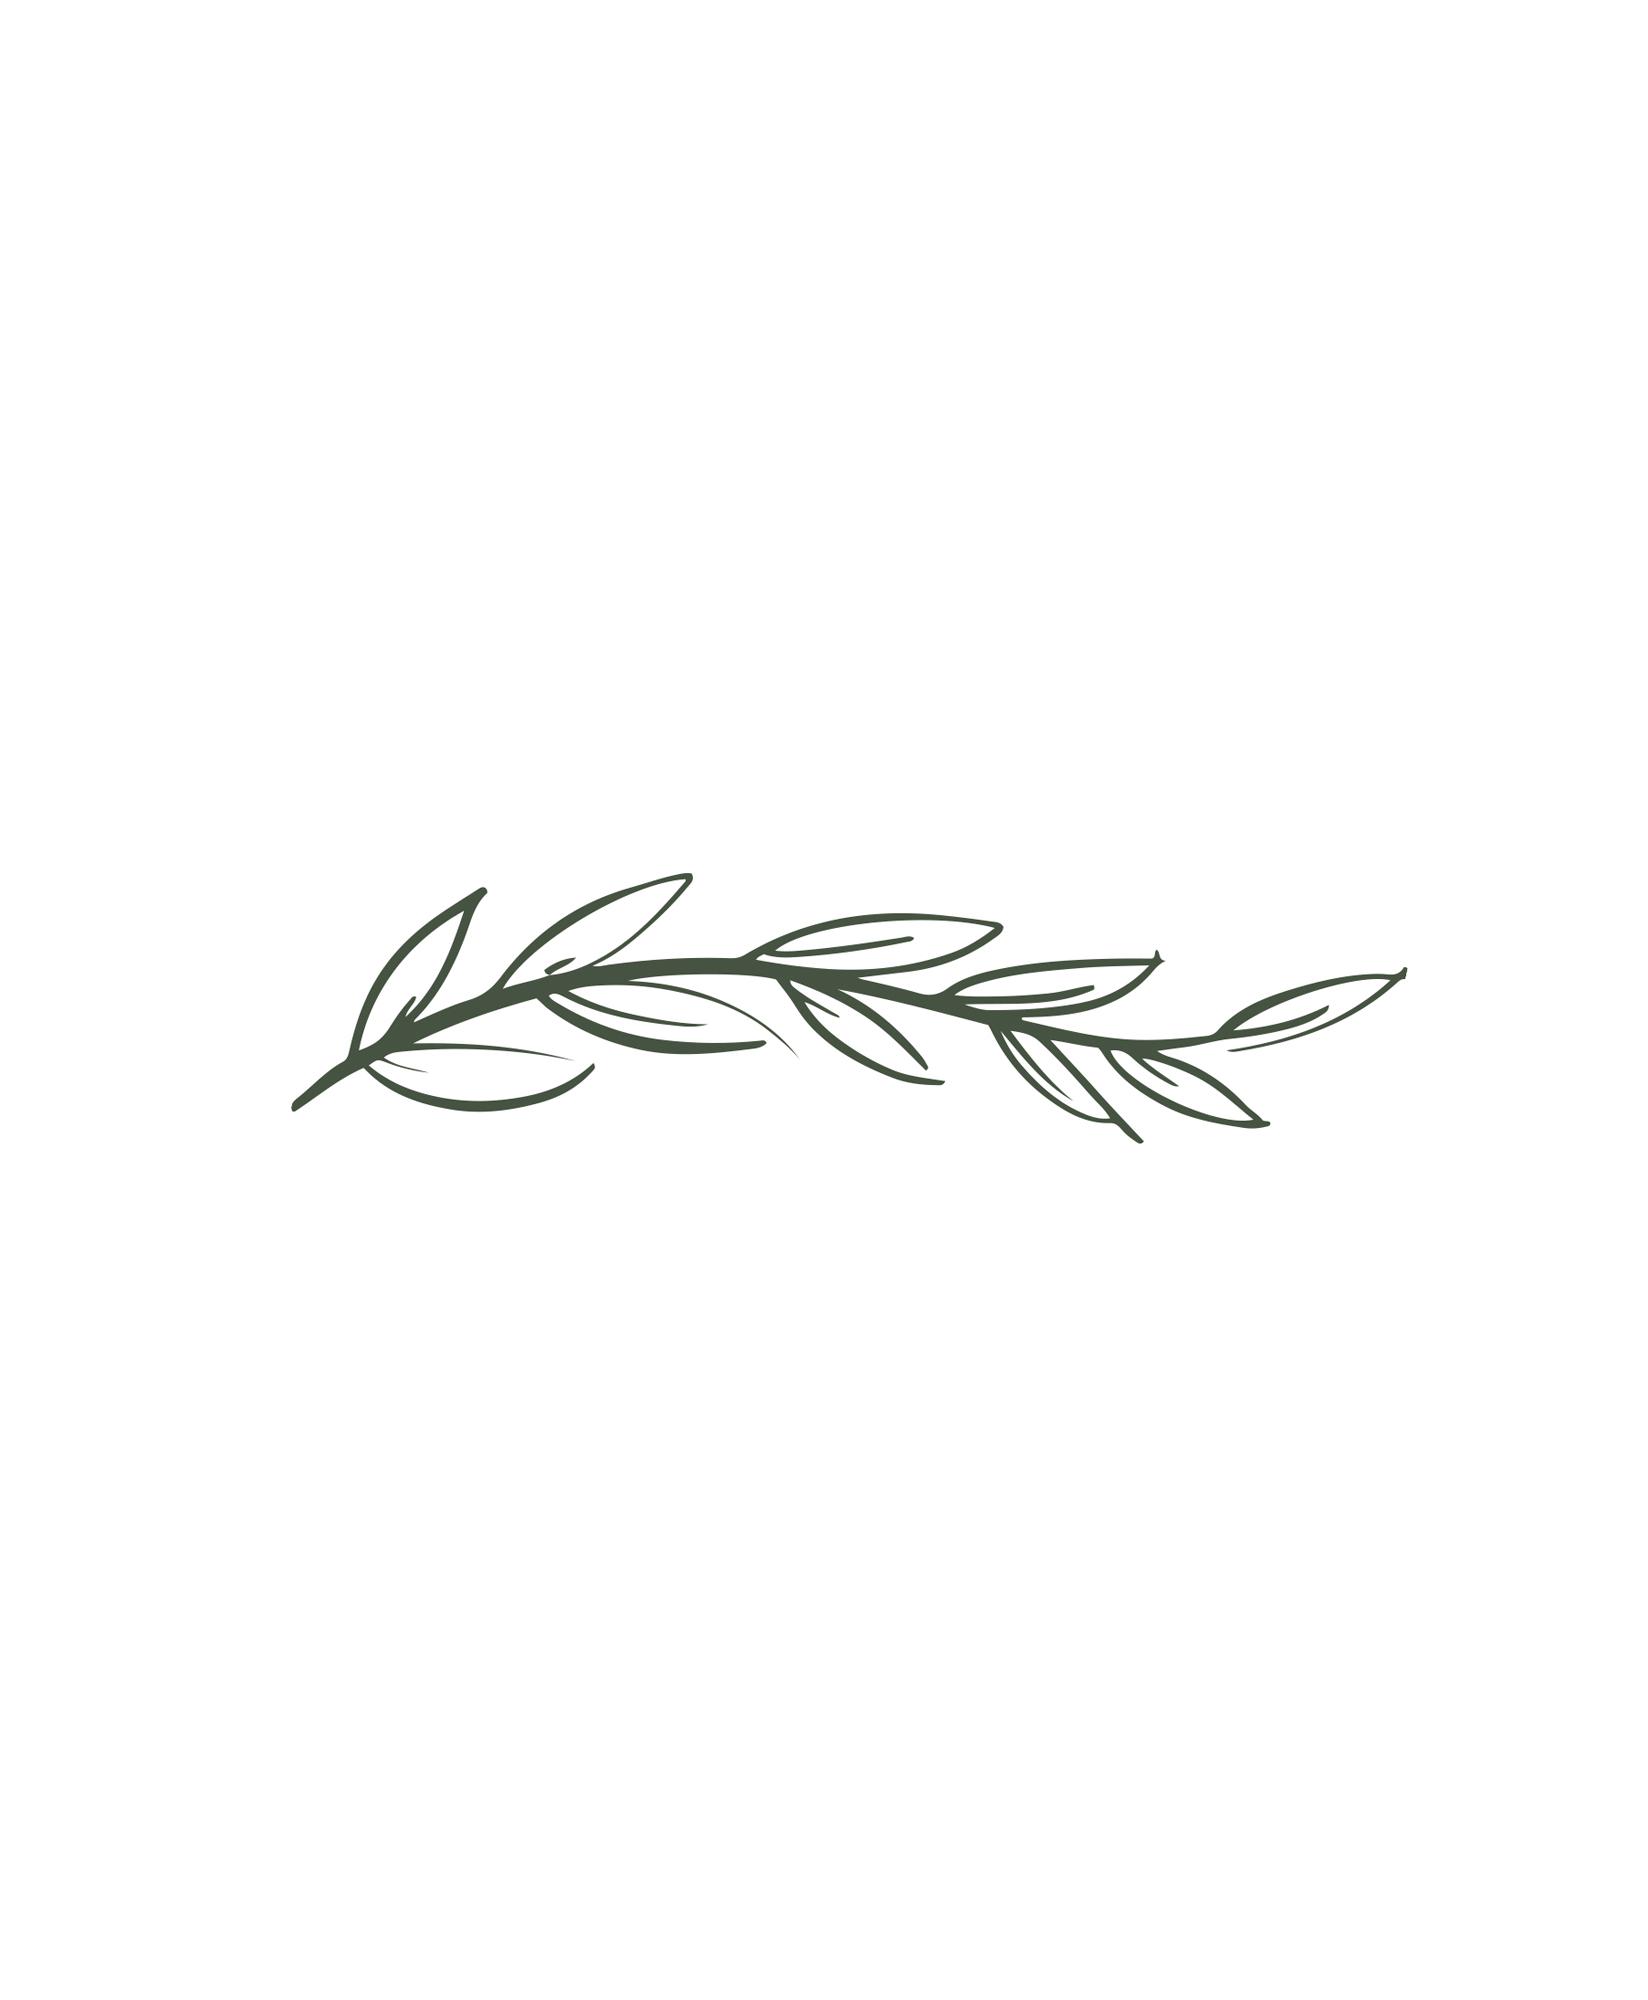 Hen and Chicks // Logo Design // Bexley Design Co